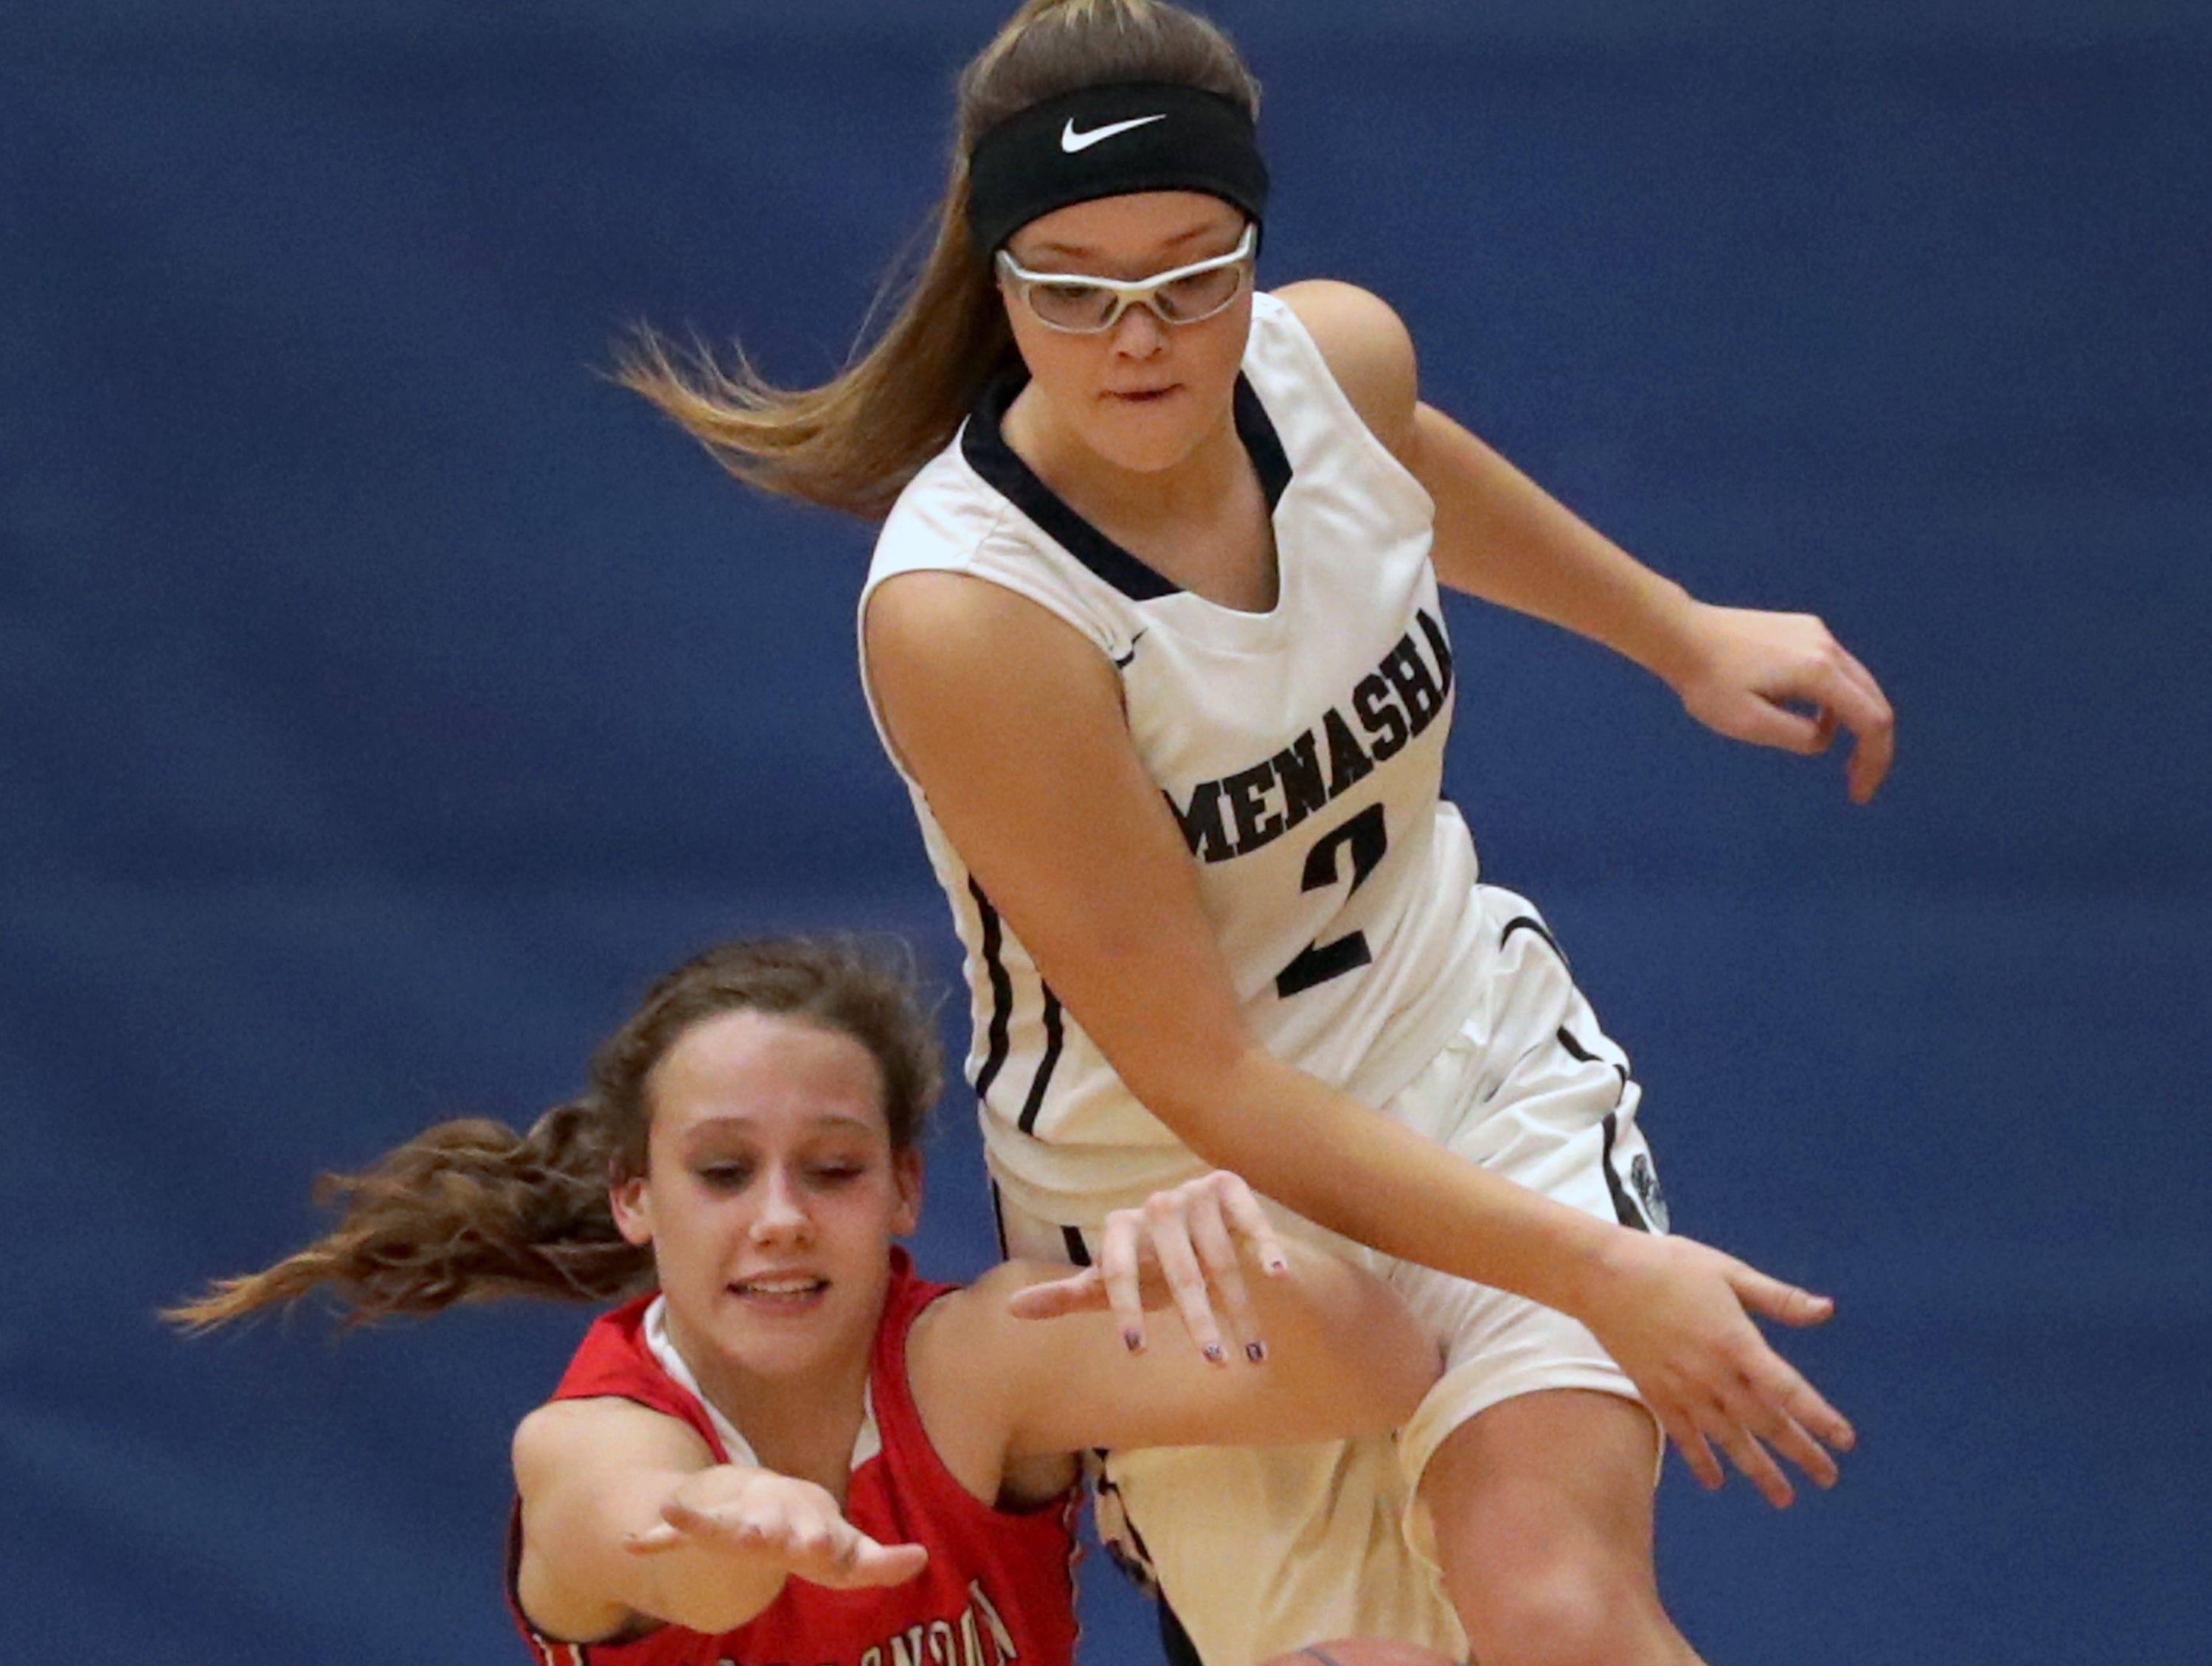 New London High School's #23 BreAnna Hacker against Menasha High School's #2 Kendall Olszewski during their girls basketball game on Friday, December 14, 2018, in Menasha, Wis.Wm. Glasheen/USA TODAY NETWORK-Wisconsin.